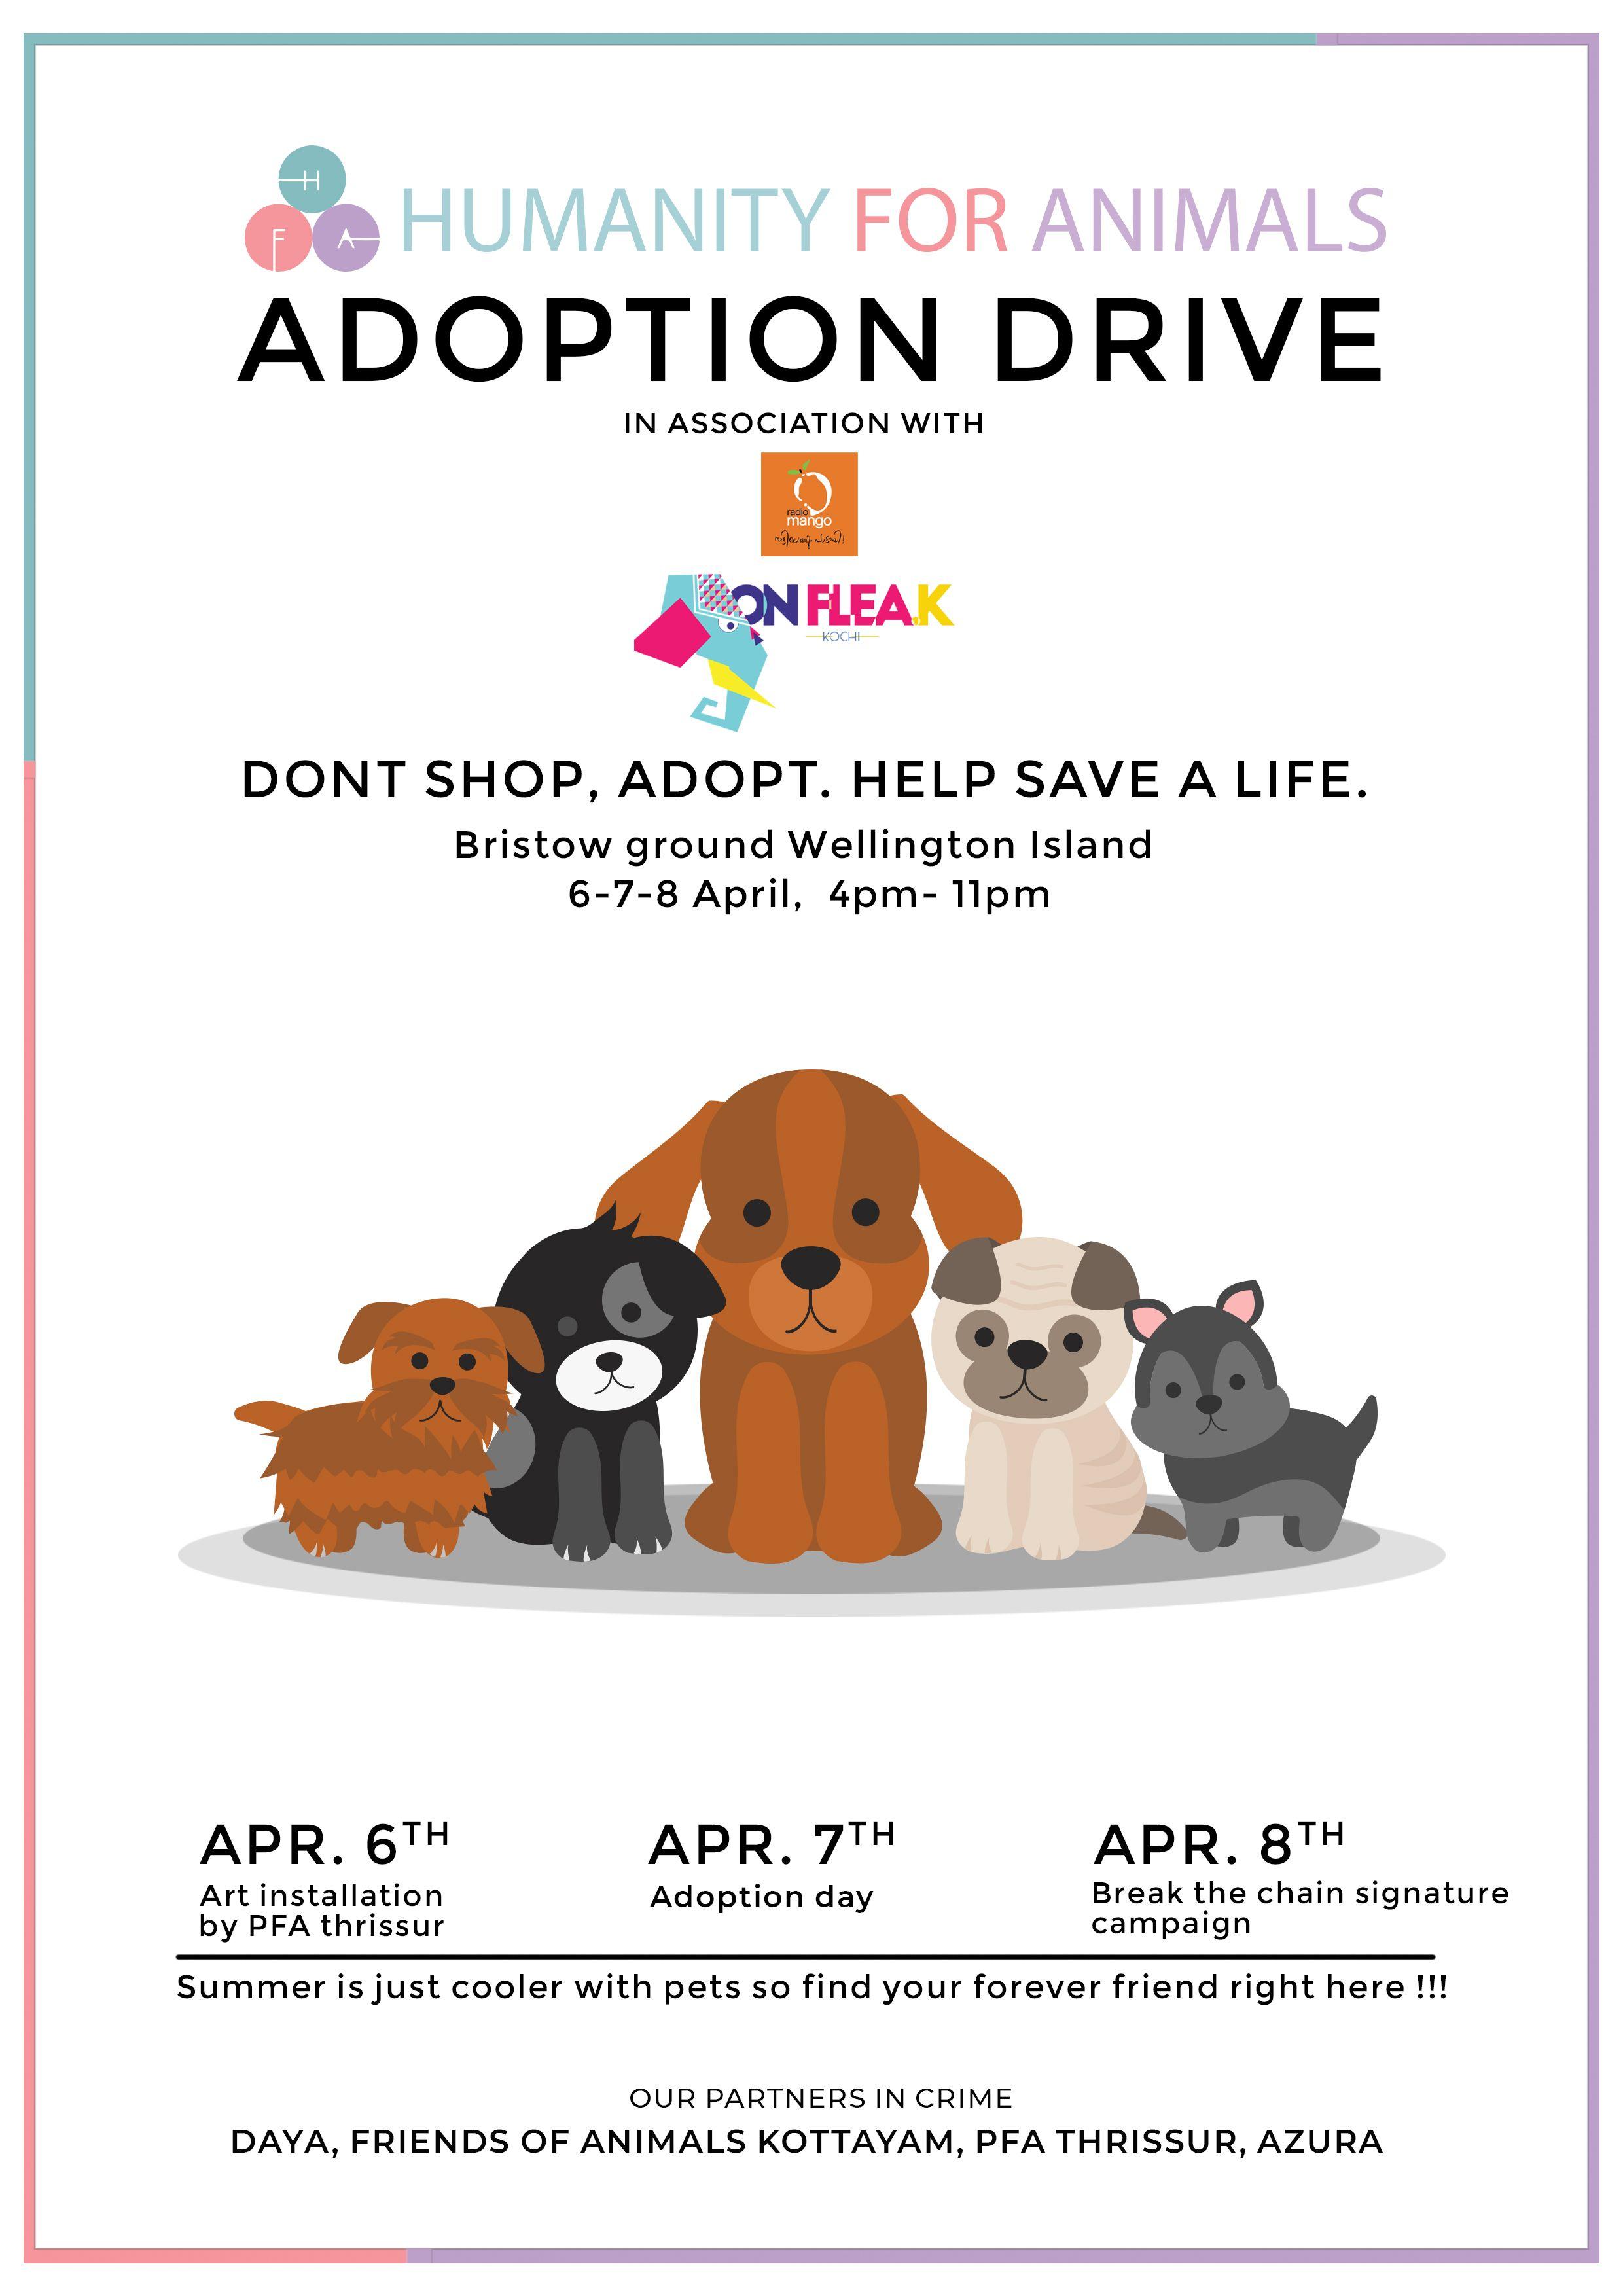 Dog Adoption Poster Kochi Kerala Kochionflea K Savealifeposter Adoption Day Cat Adoption Pet Adoption